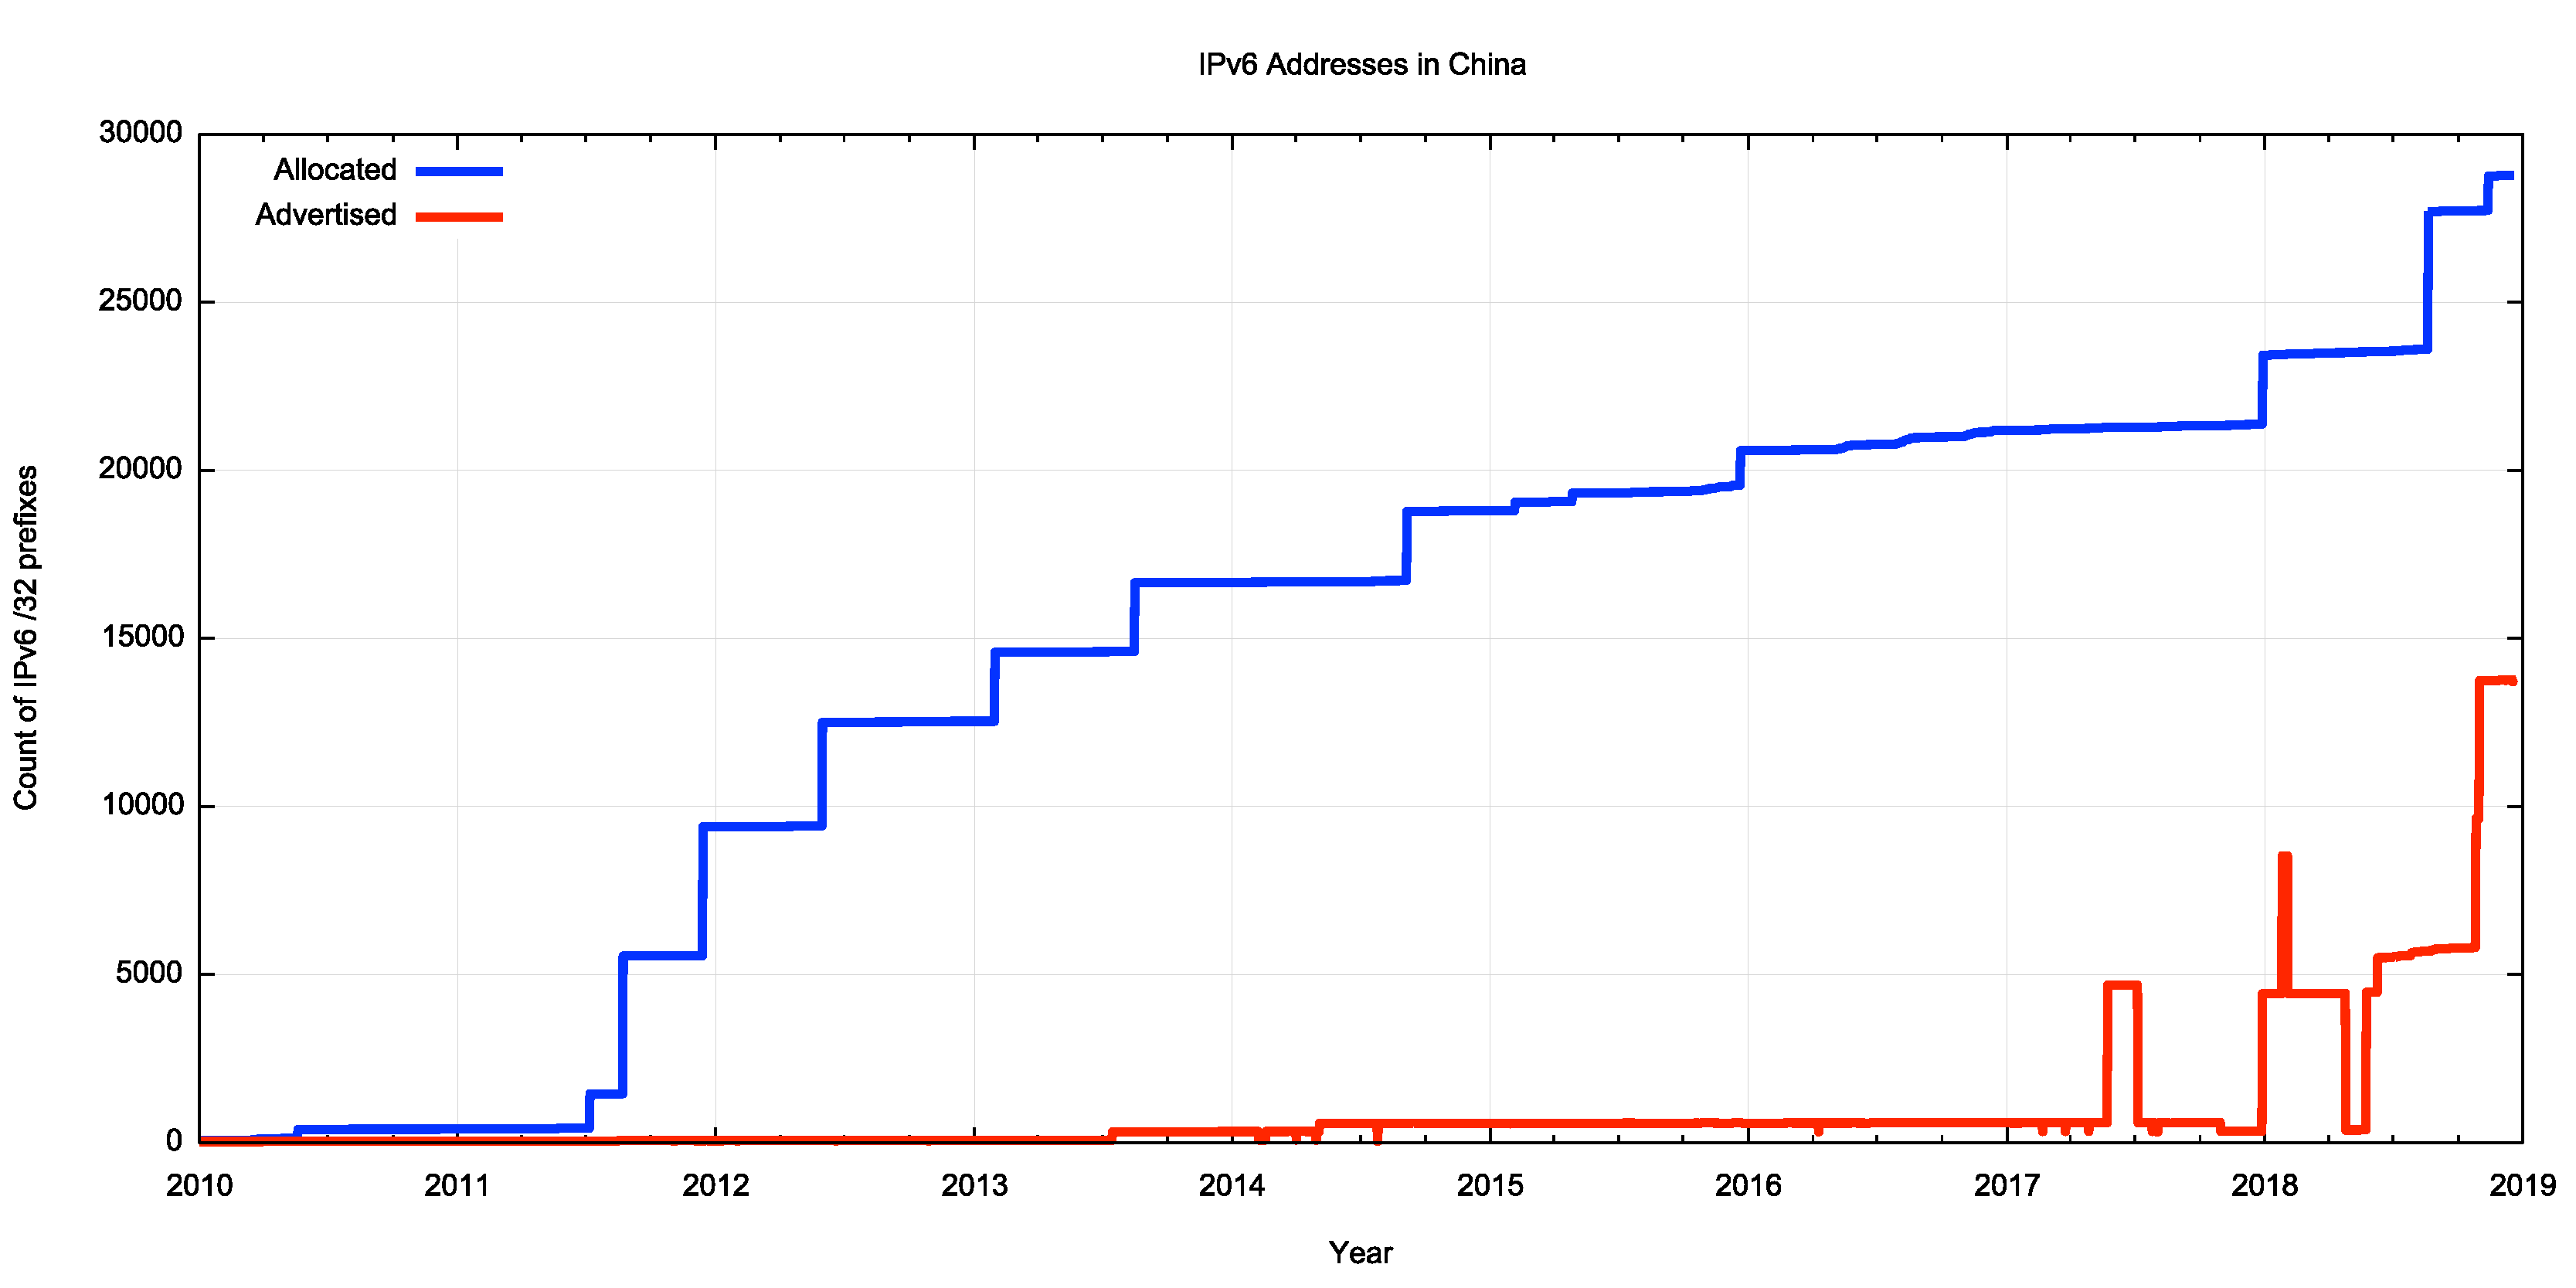 IPv6在中国 - 大规模部署进行中 进展非常明显